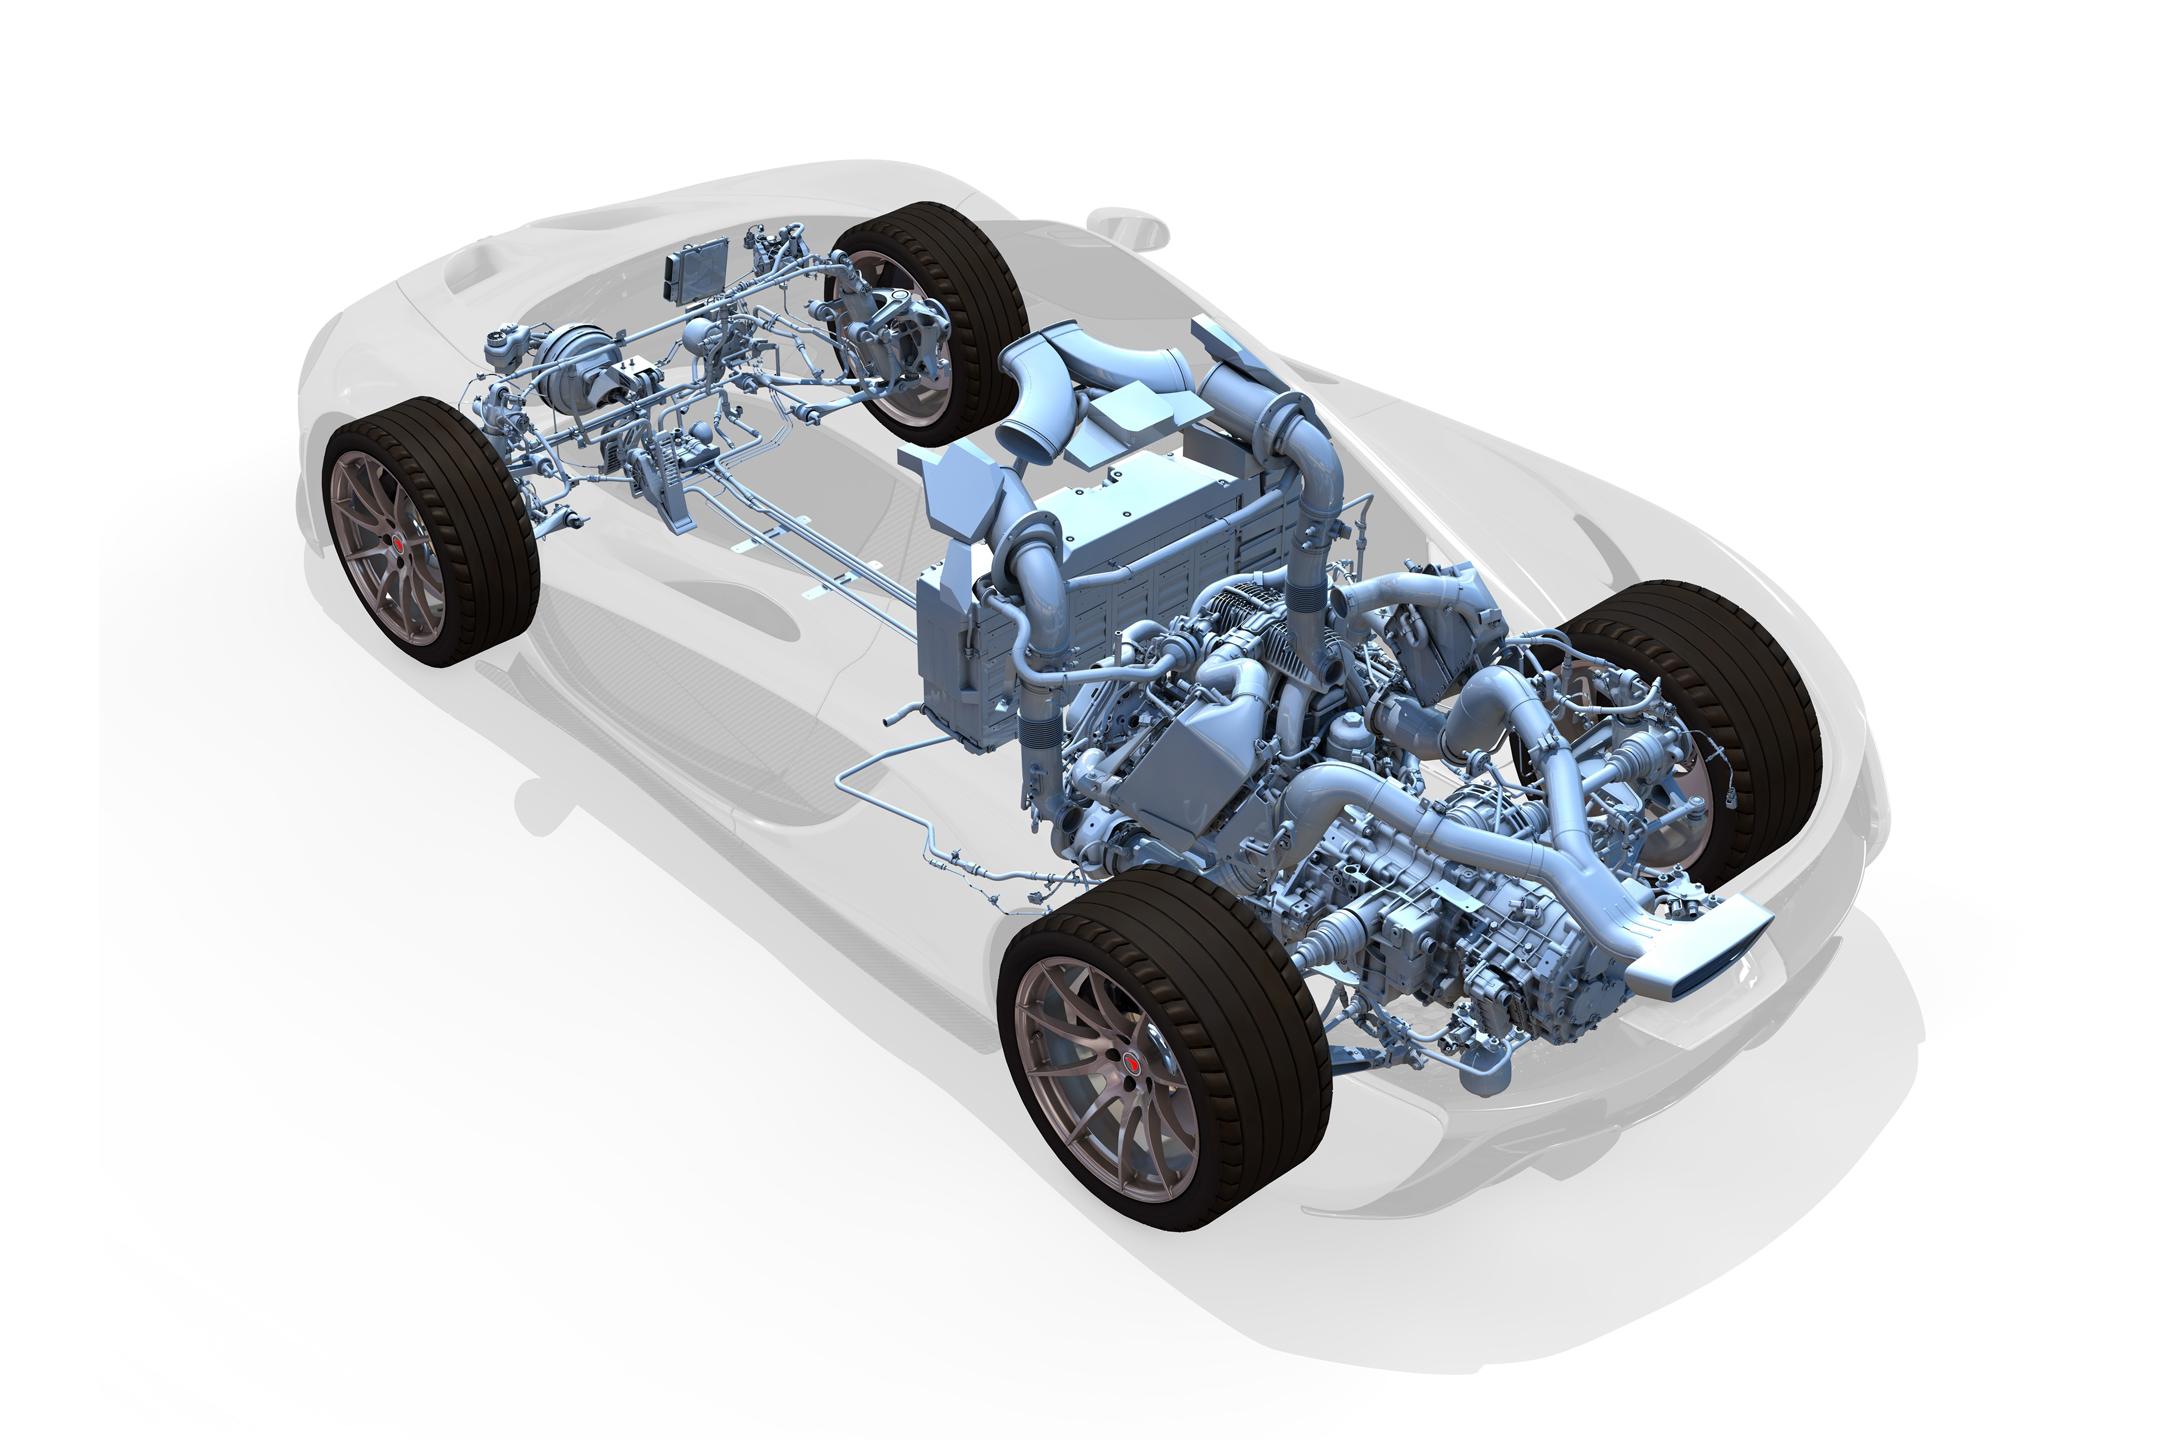 McLaren P1 - 2013 - powertrain